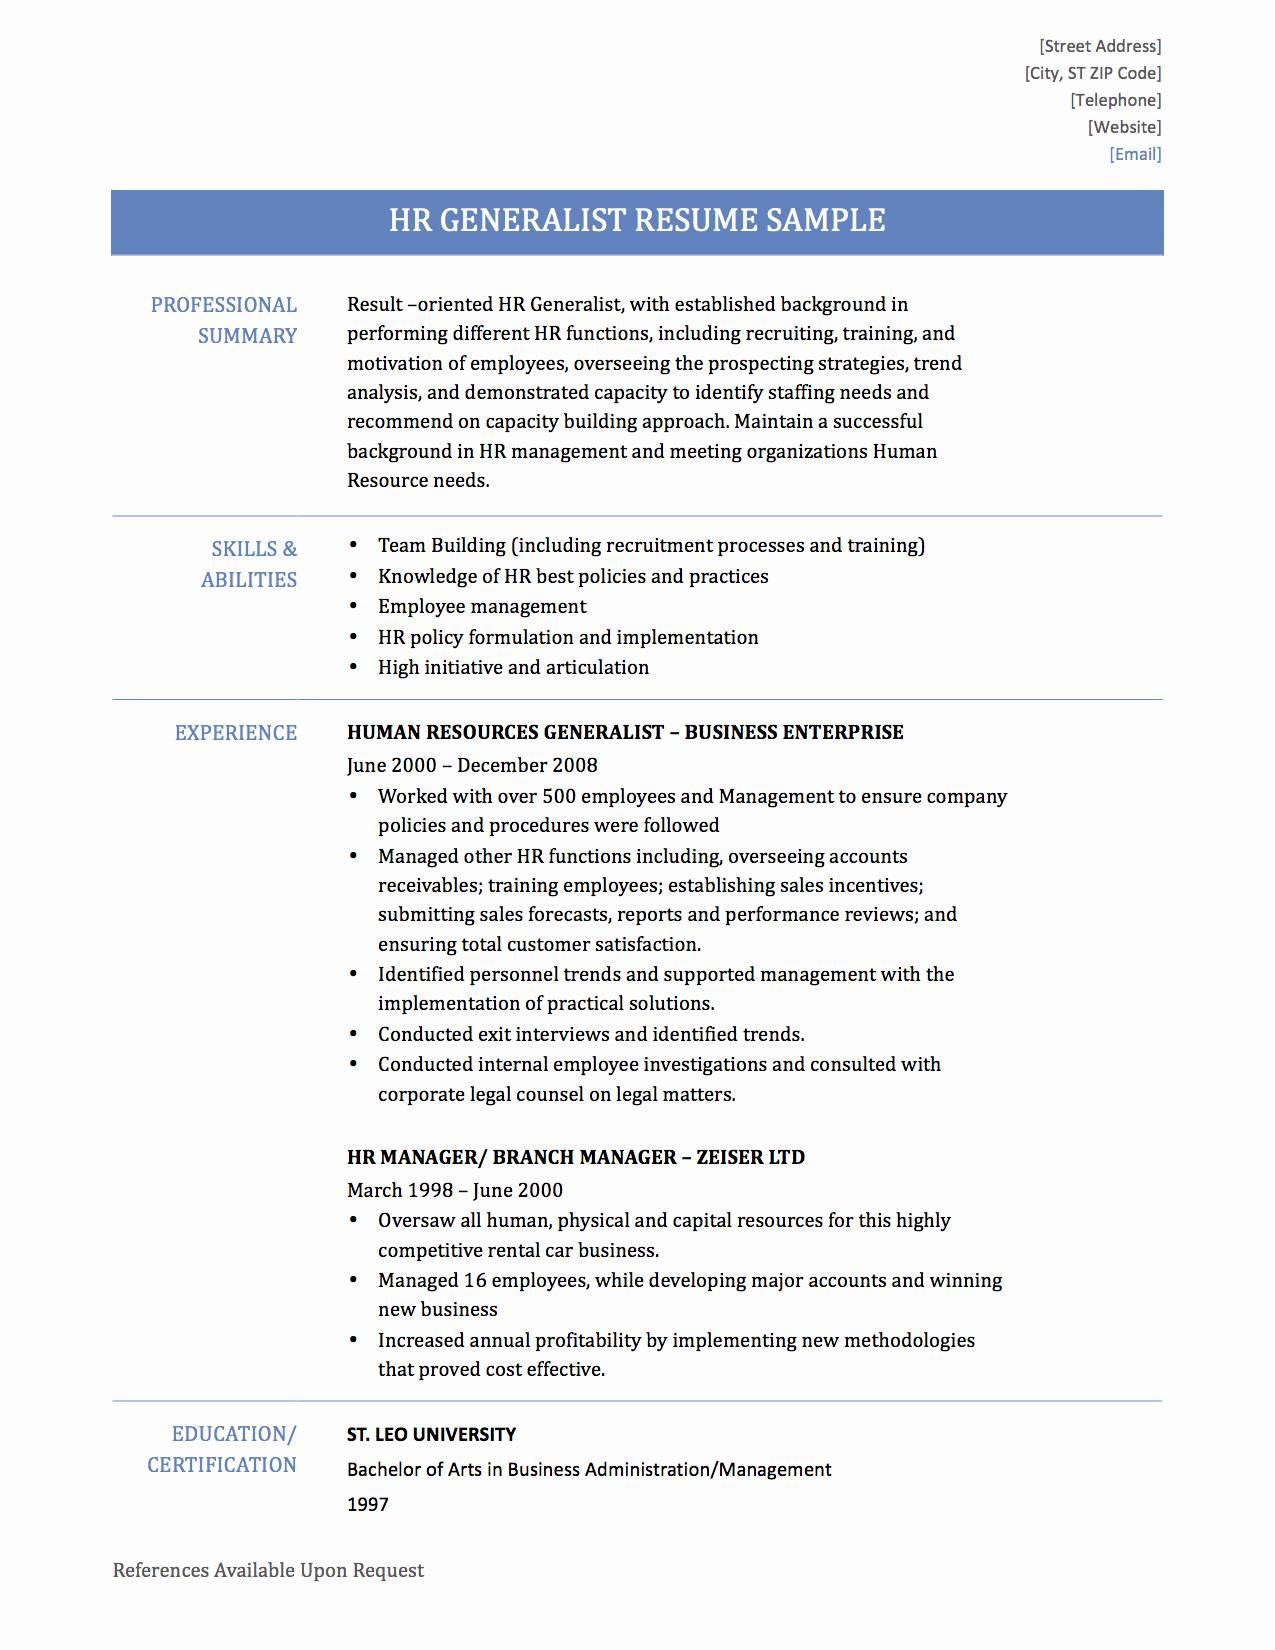 Human Resource Generalist Resume Template